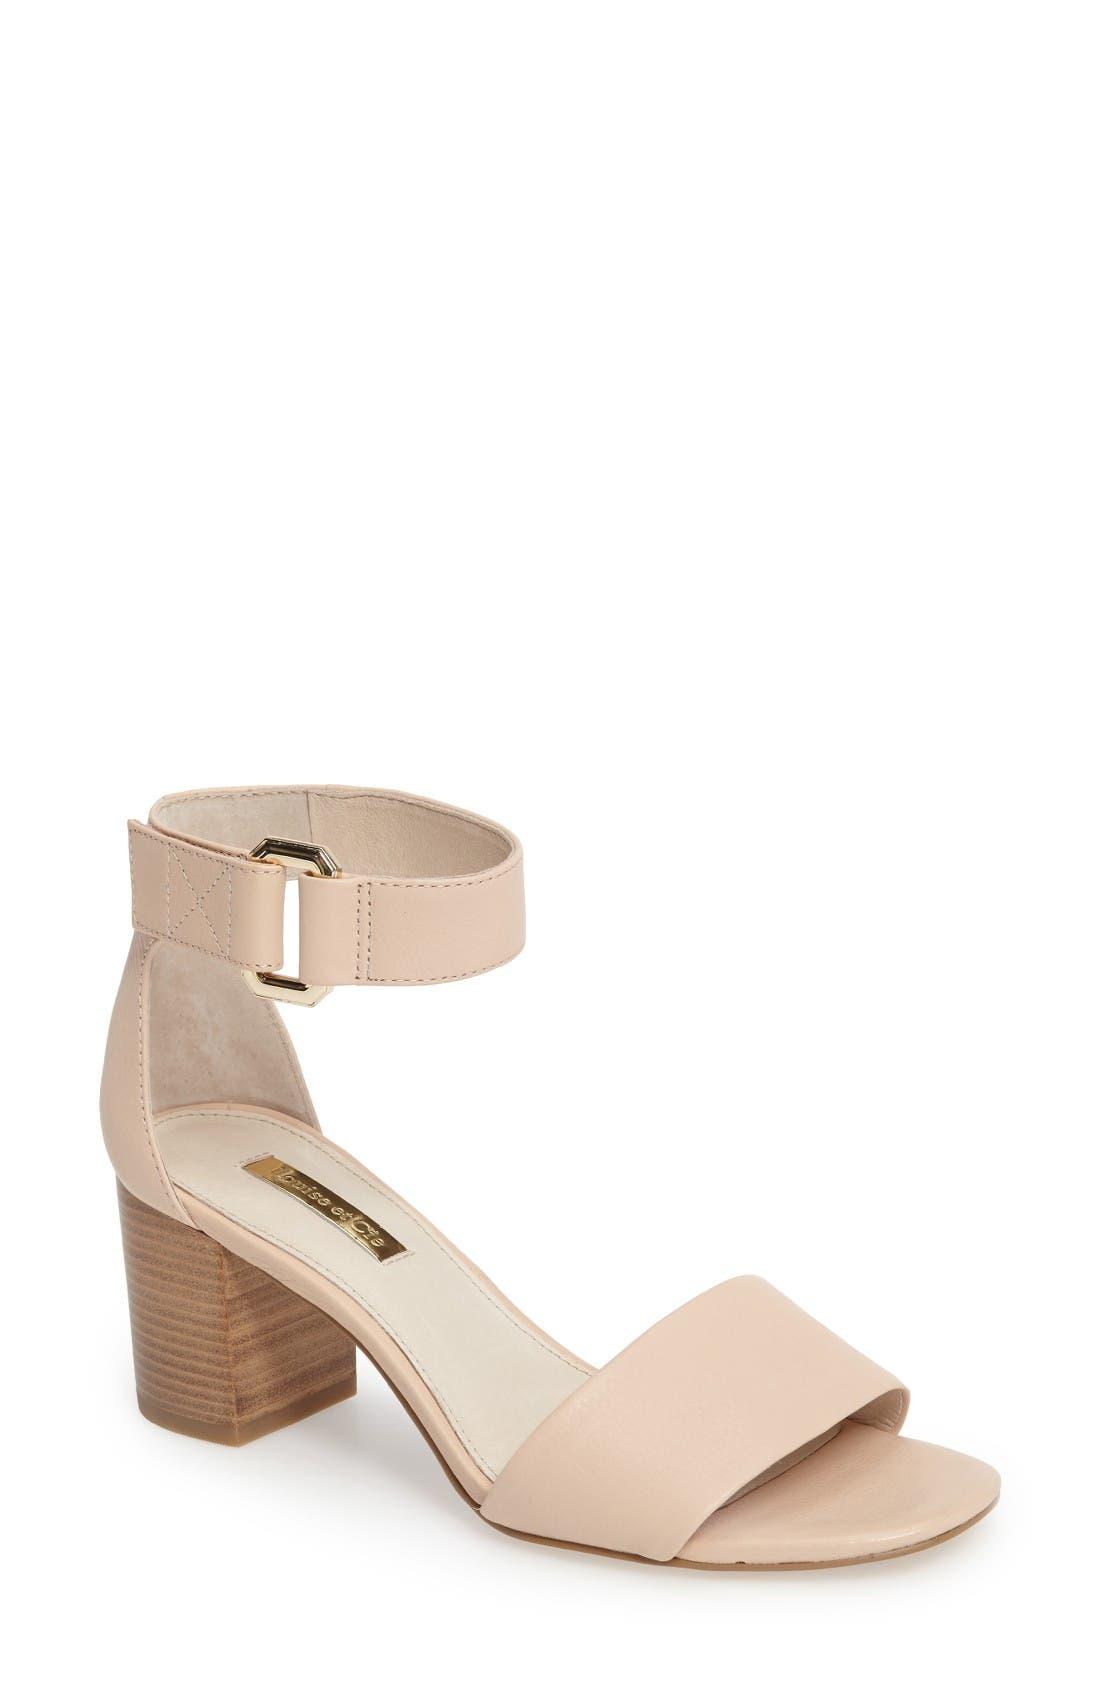 Alternate Image 1 Selected - Louise et Cie Kambria Block Heel Sandal (Women)